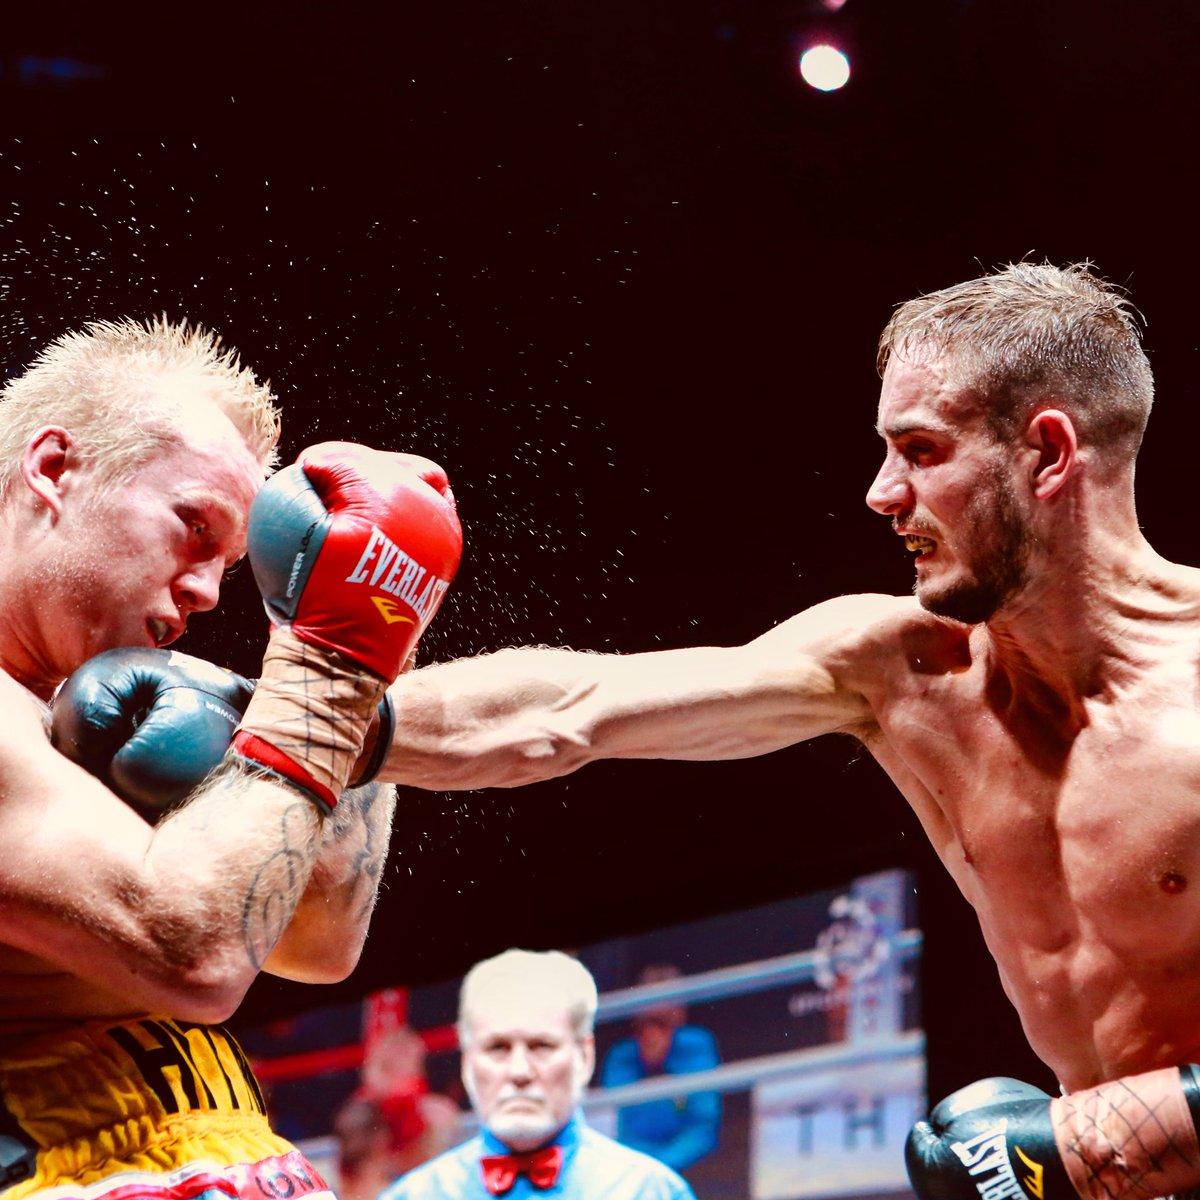 Aus-Boxing com on Twitter: